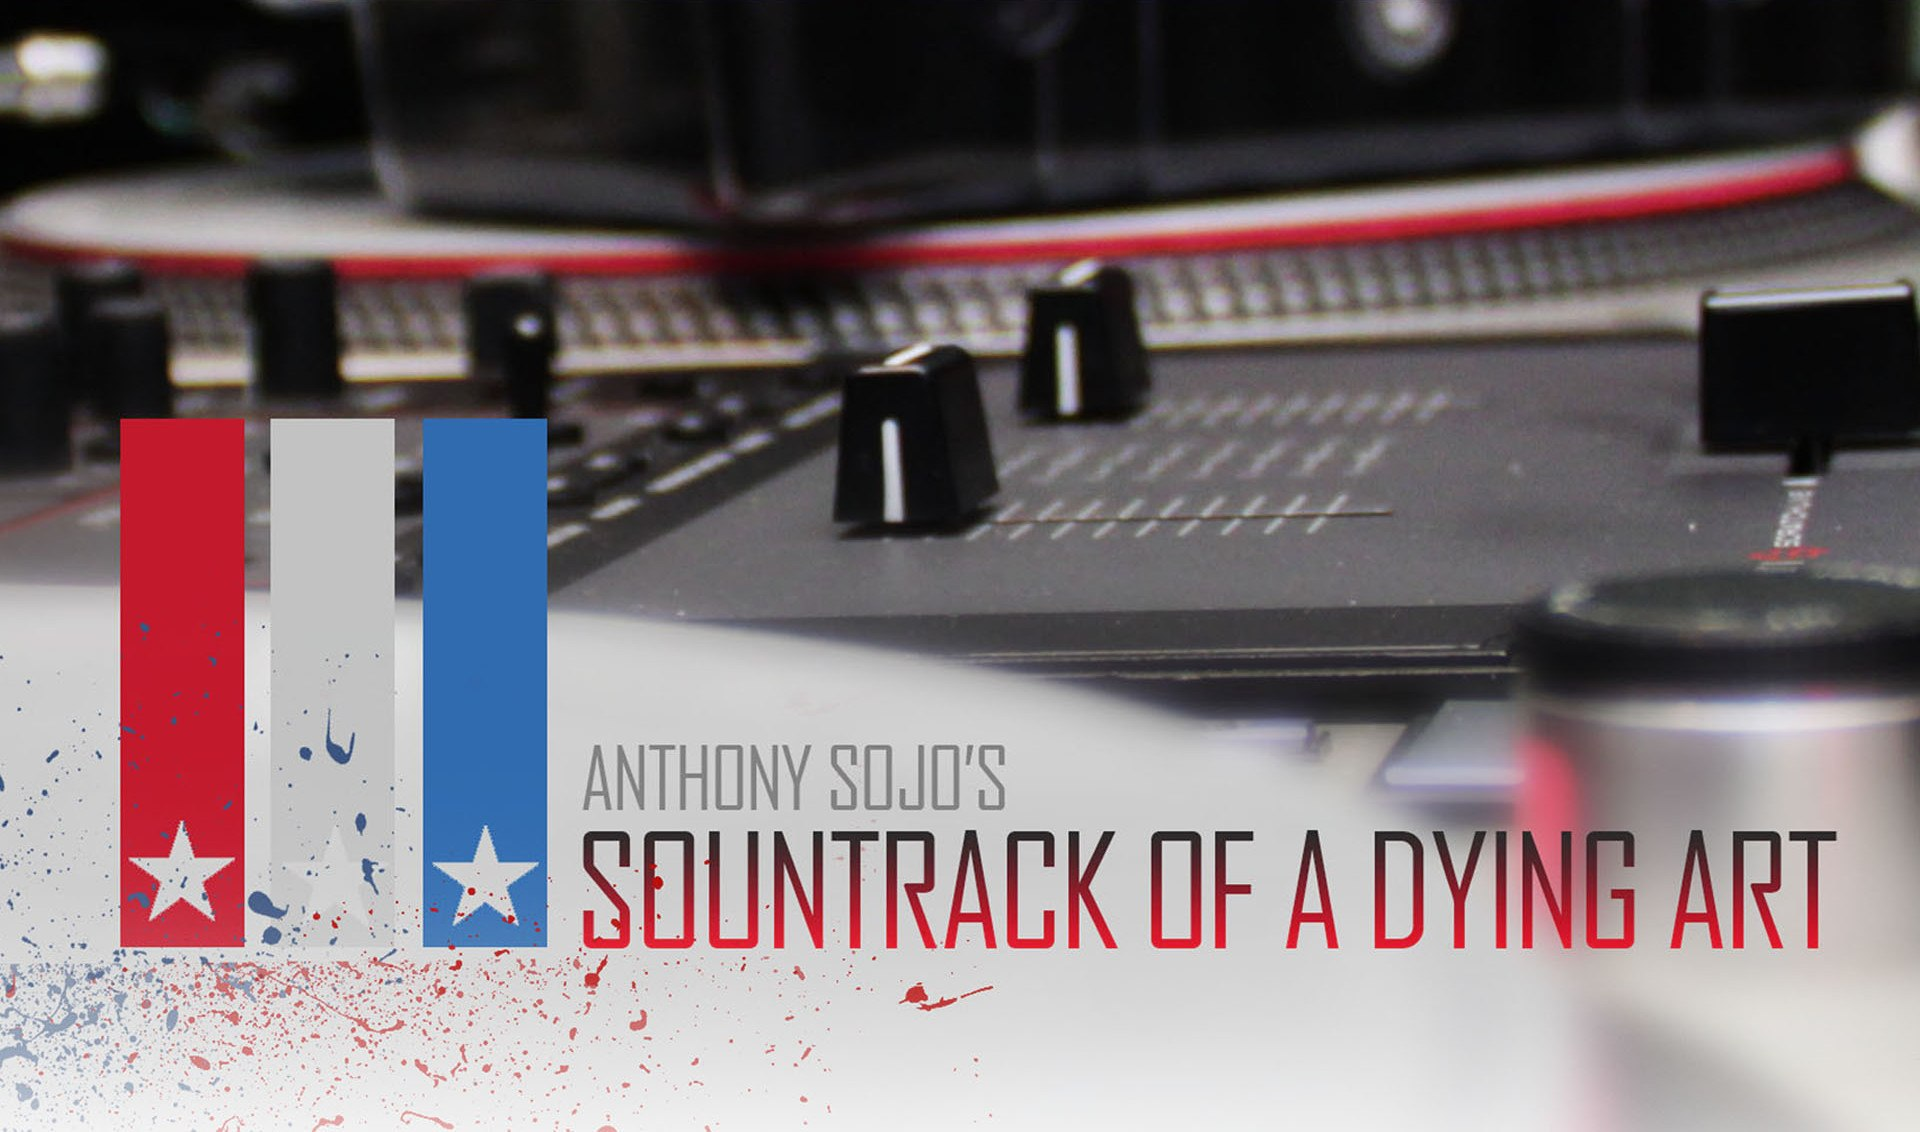 soundtrack_of_a_dyning_art_Sojo_studio_dj_producer_nj_senate_djs_edm_hip_hop_trap_twerk